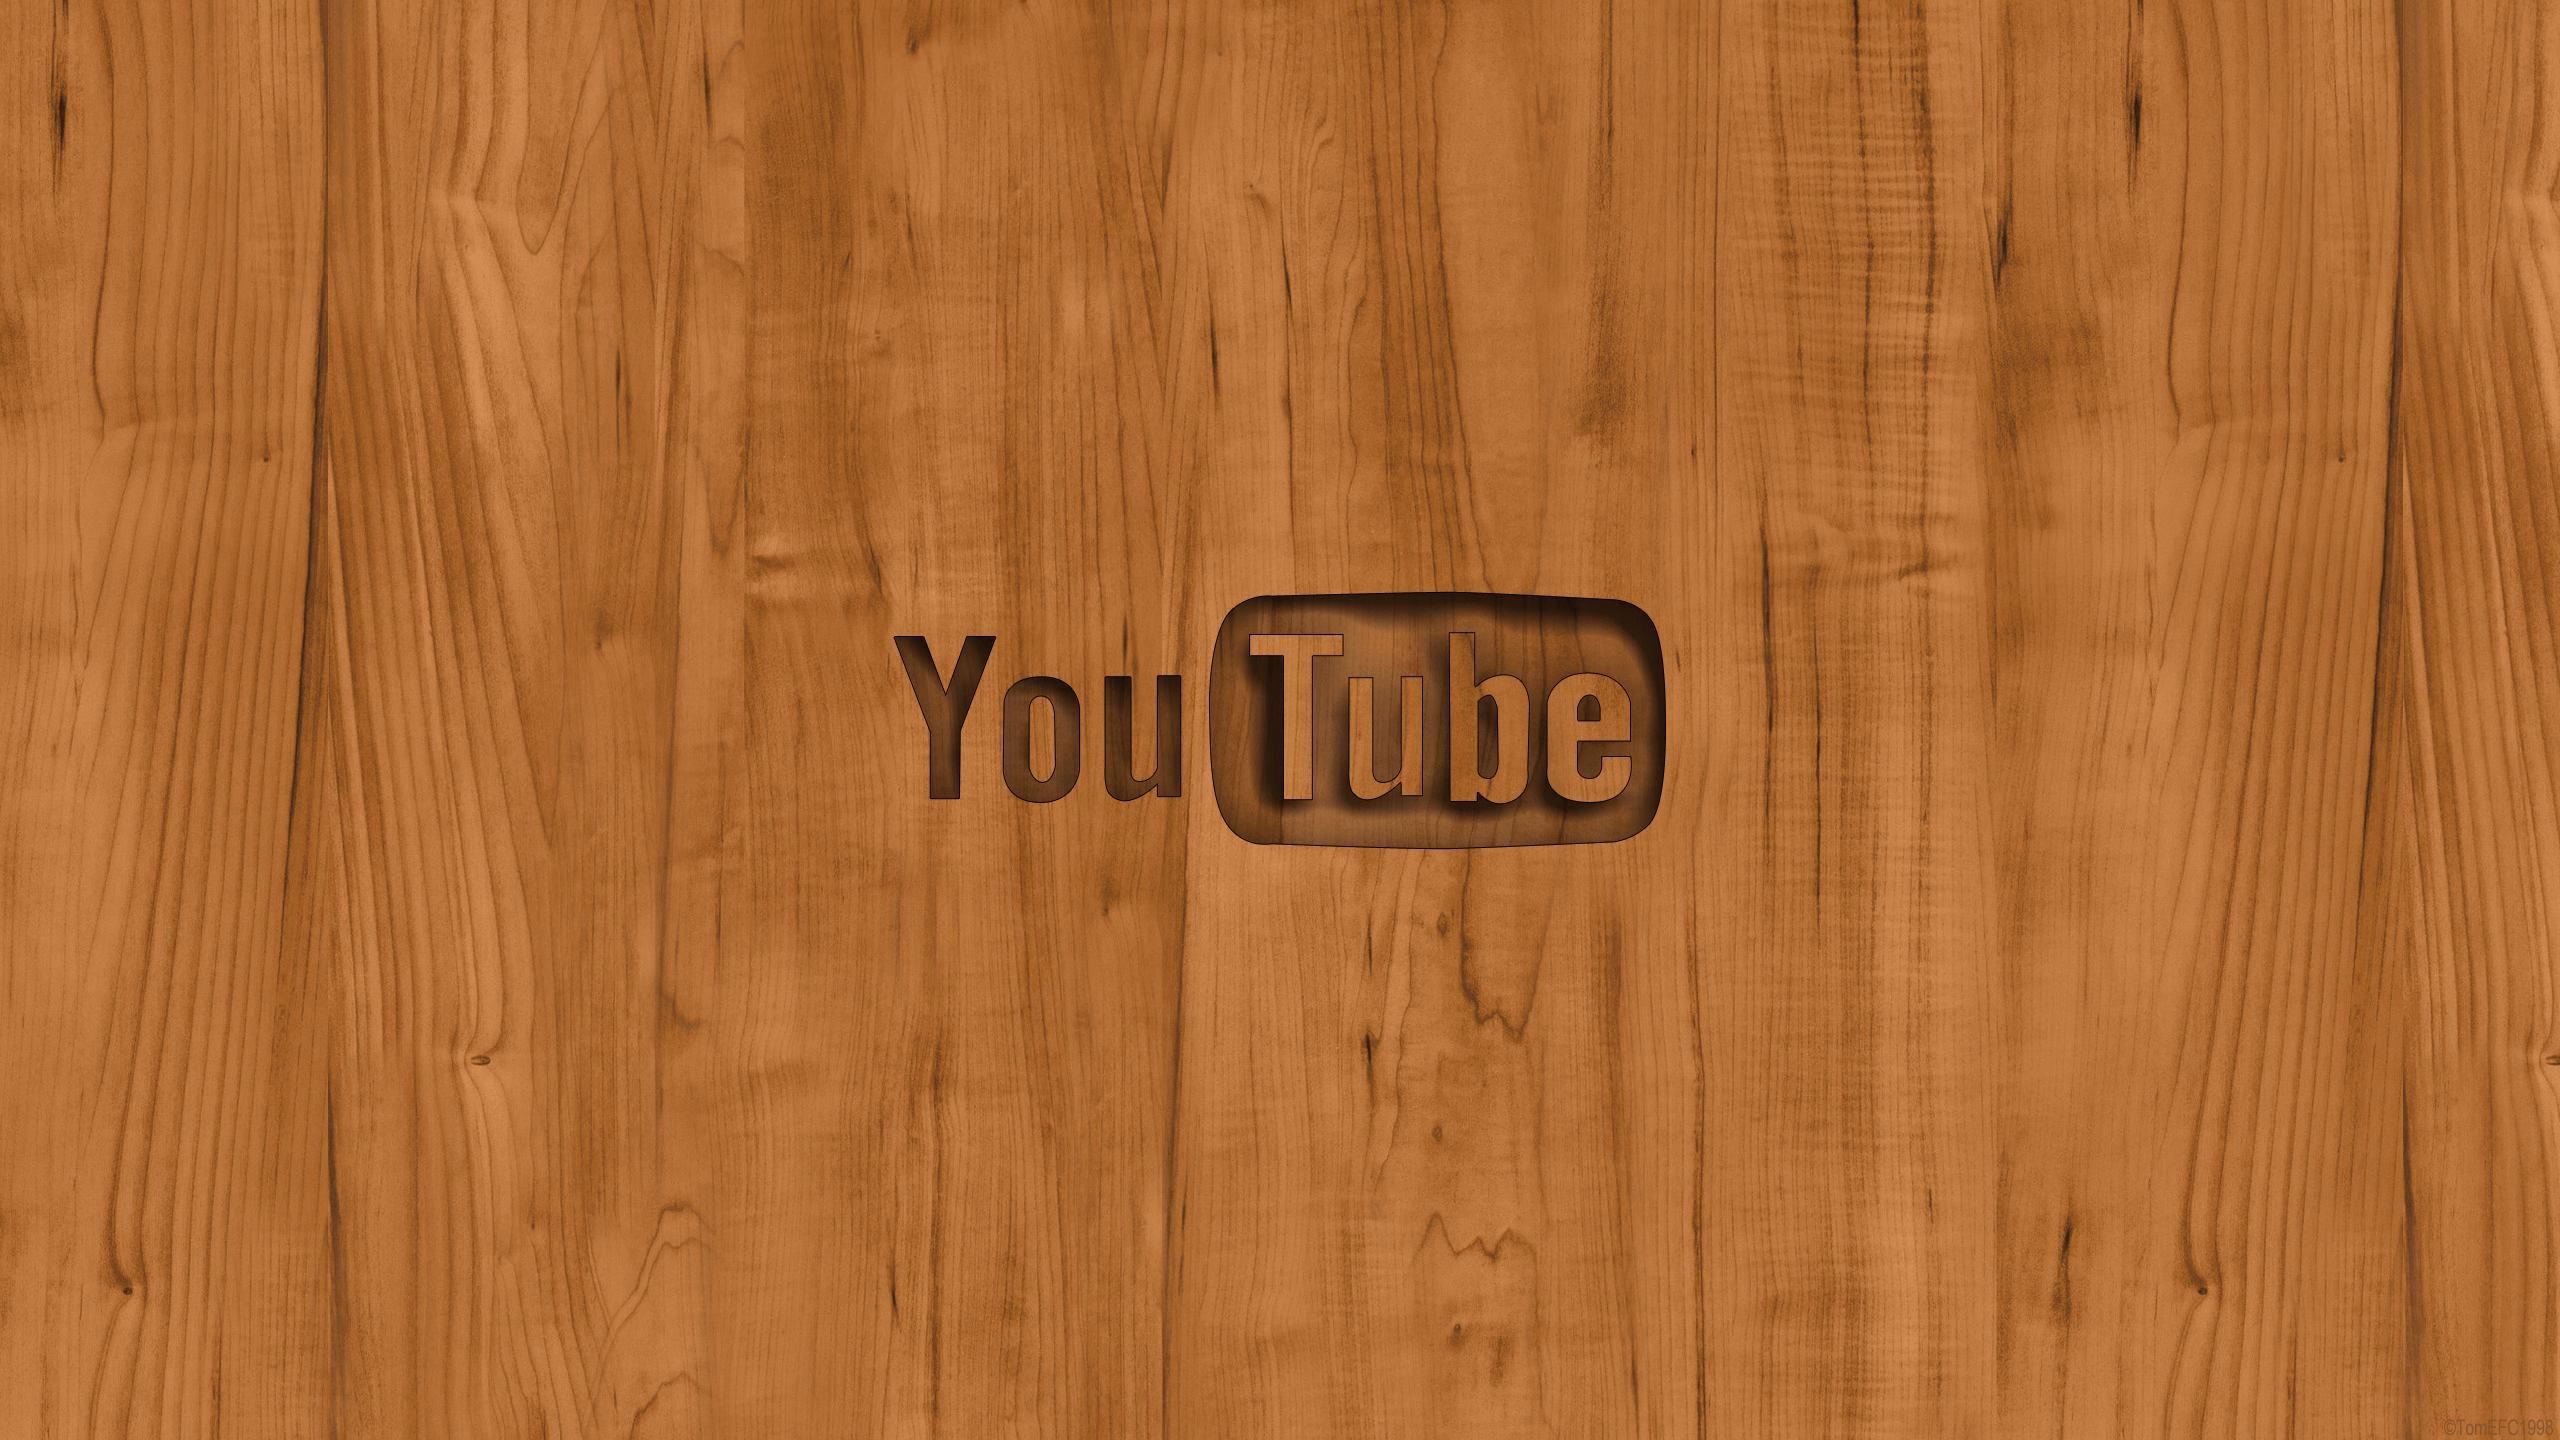 Download 1000+ Wallpaper Android Hd Youtube HD Paling Baru